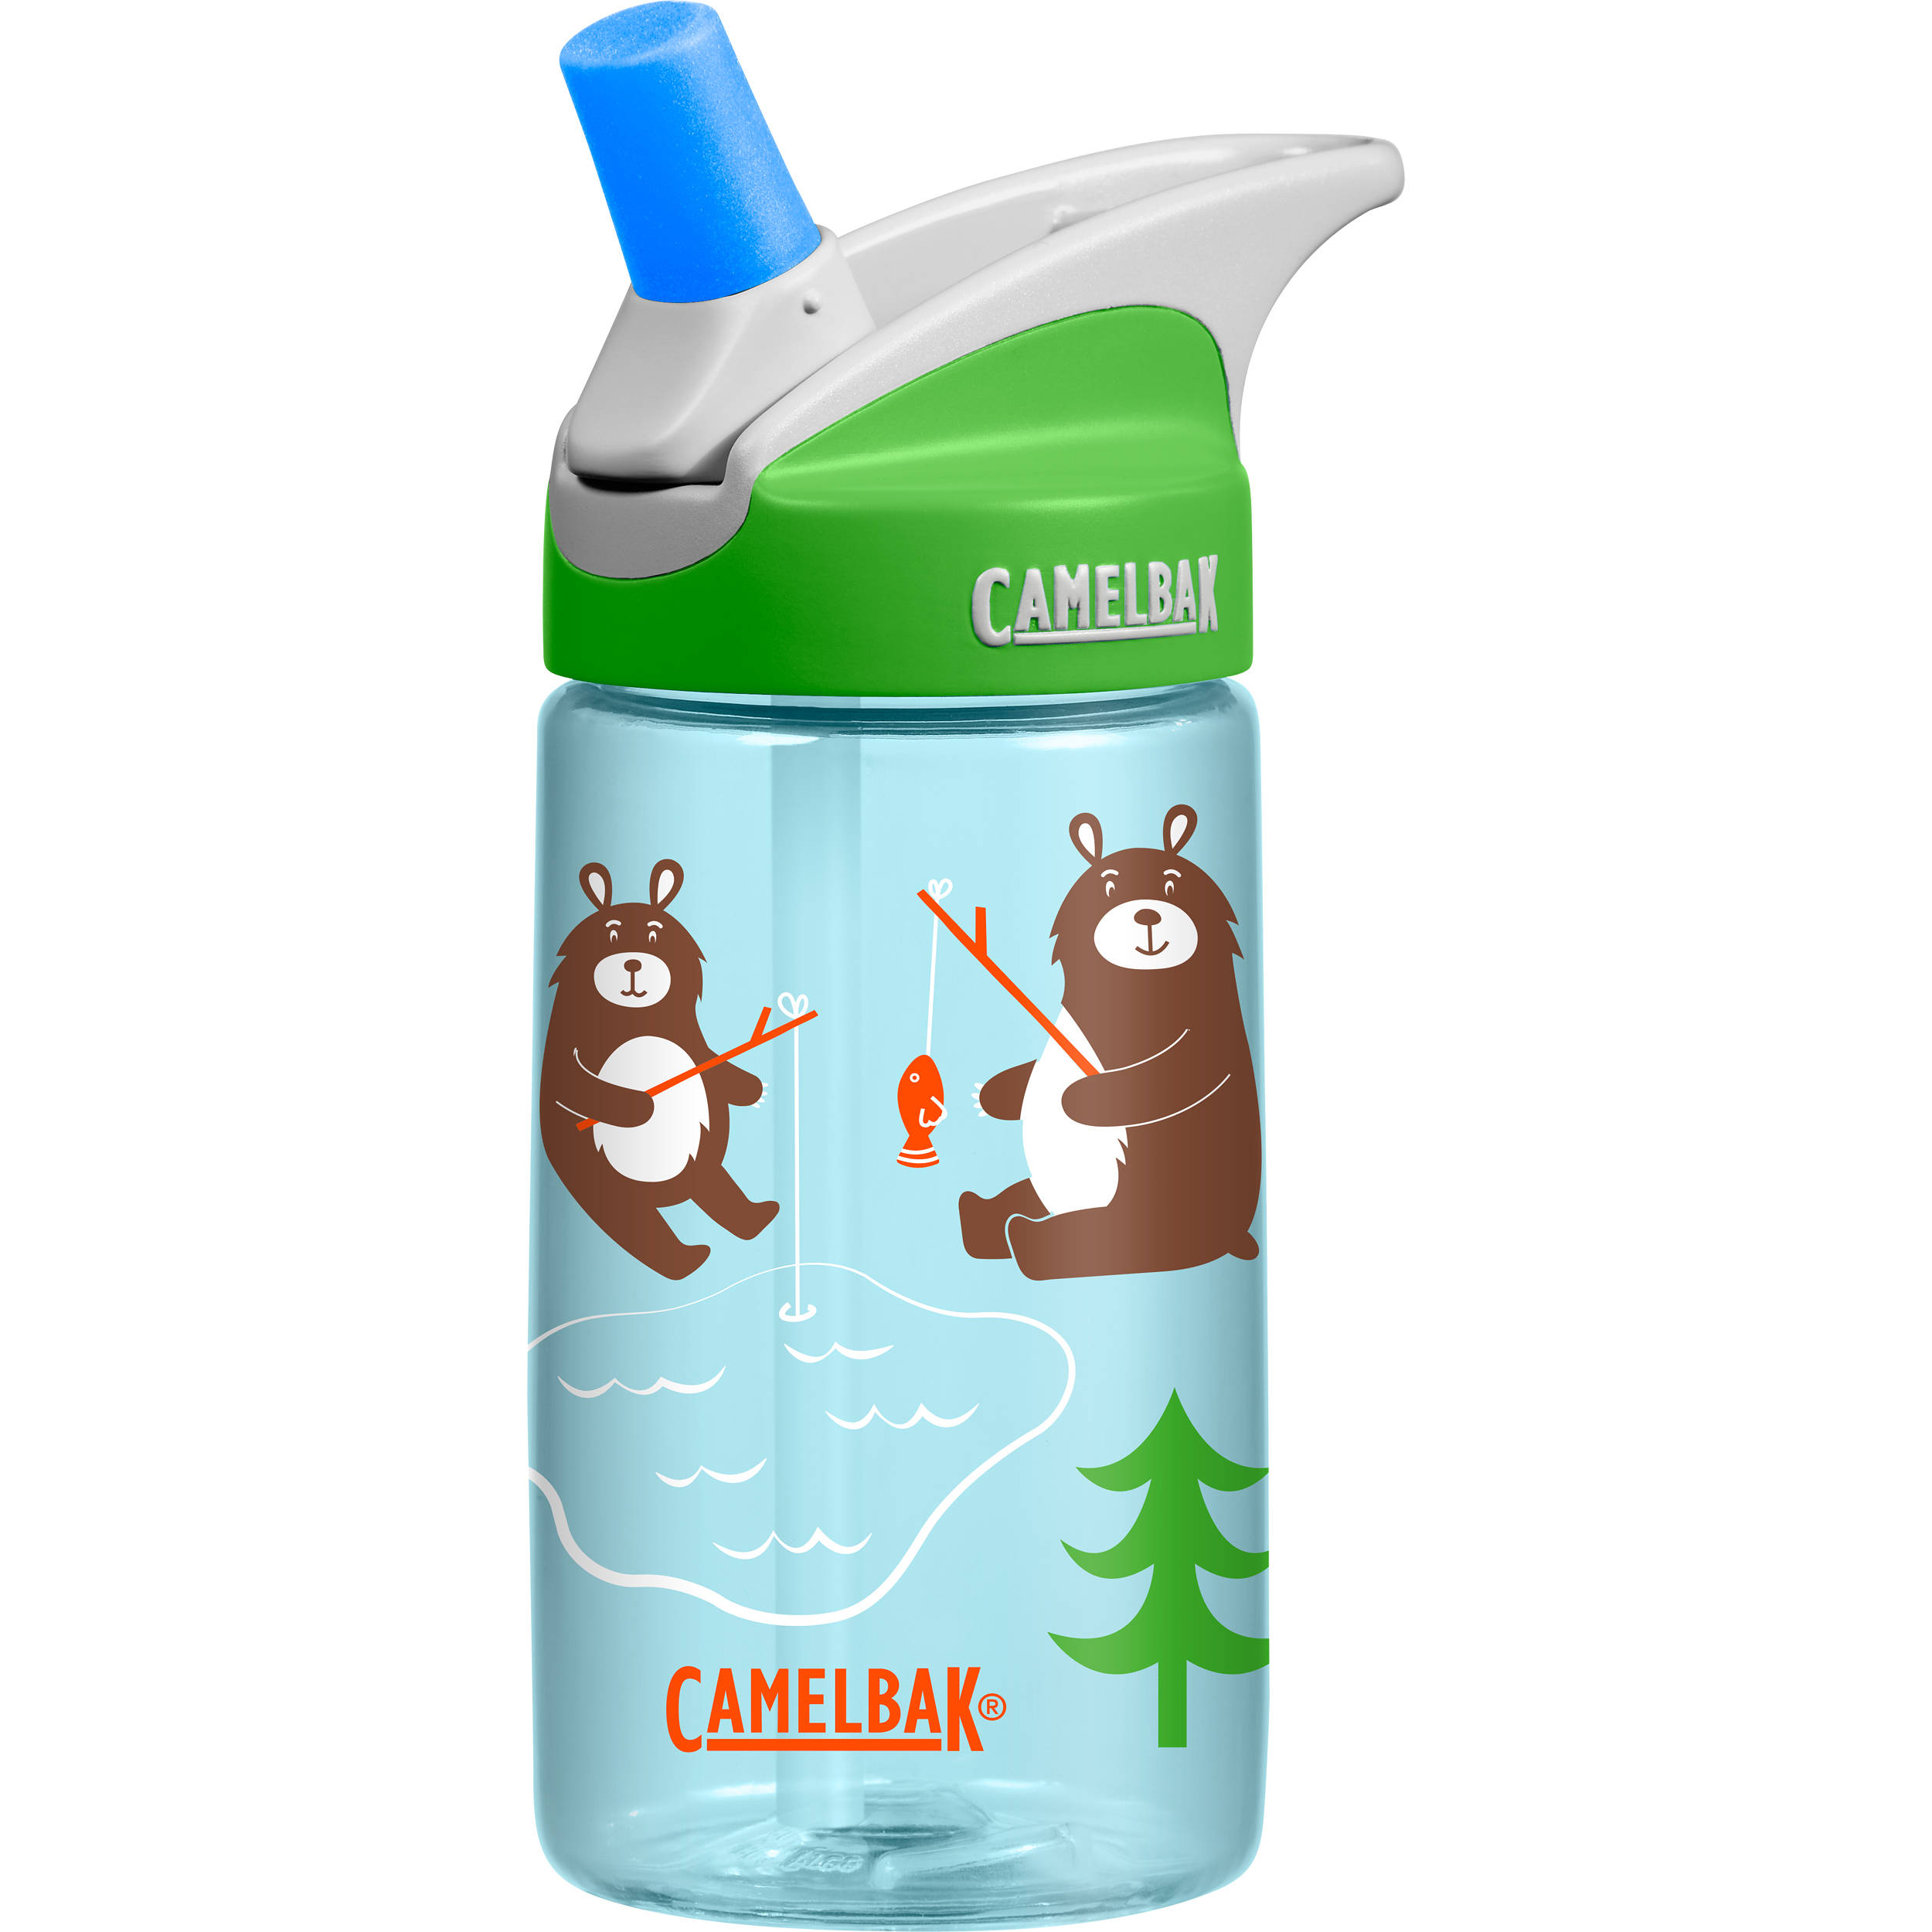 CAMELBAK 0.4L eddy Kids Insulated Water Bottle 54130 B&H Photo